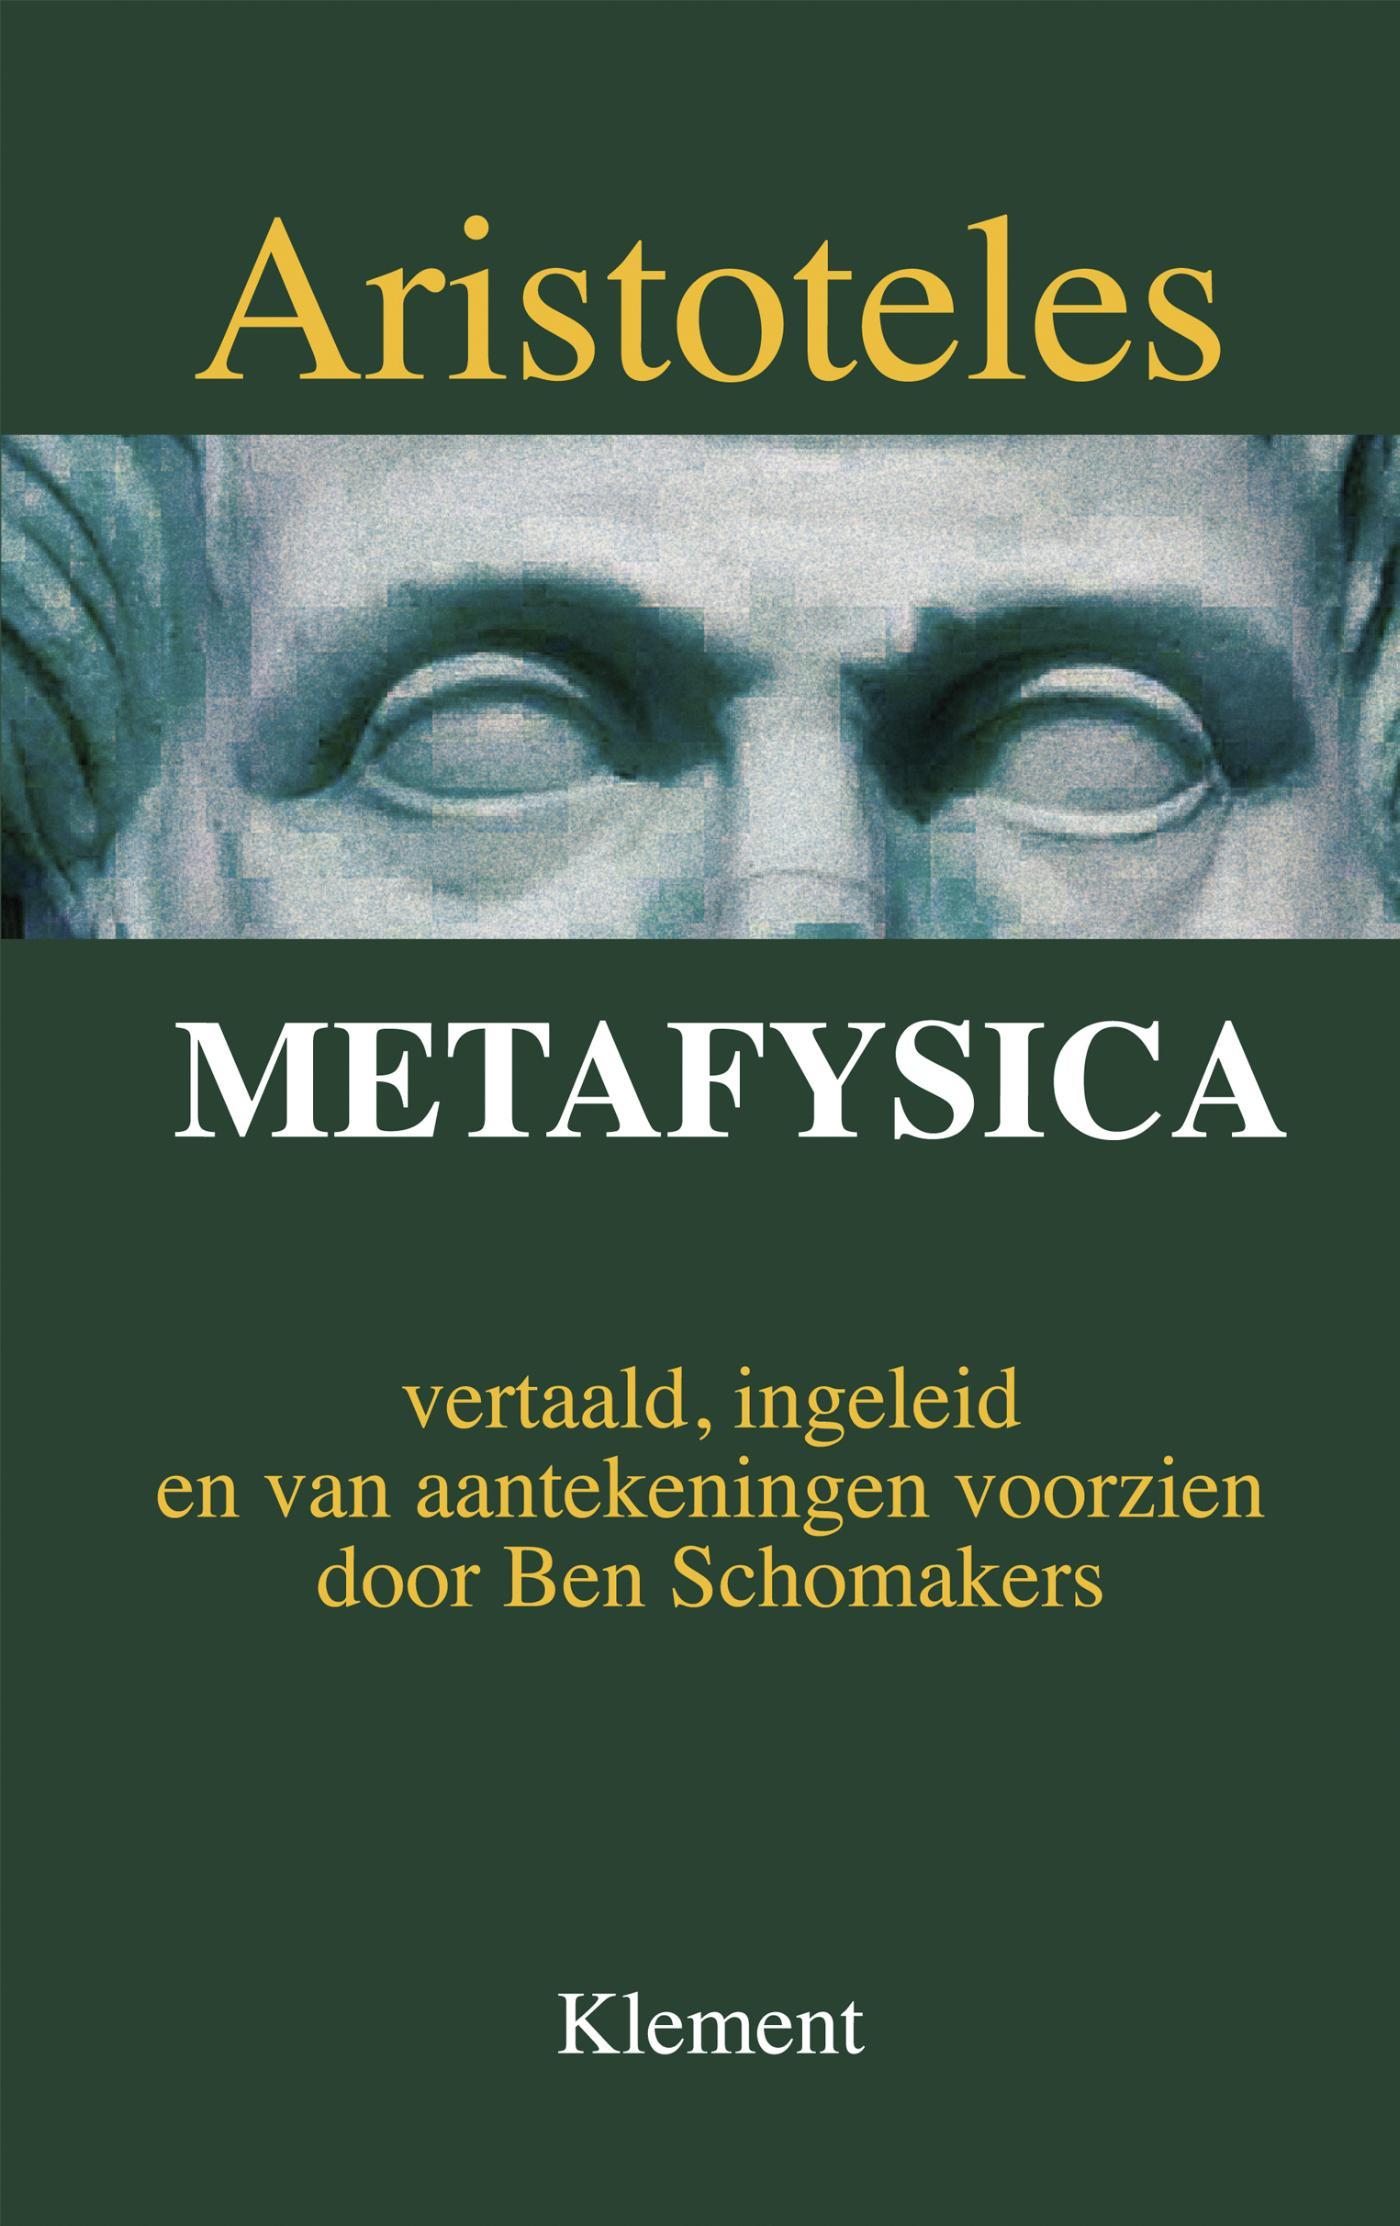 Metafysica